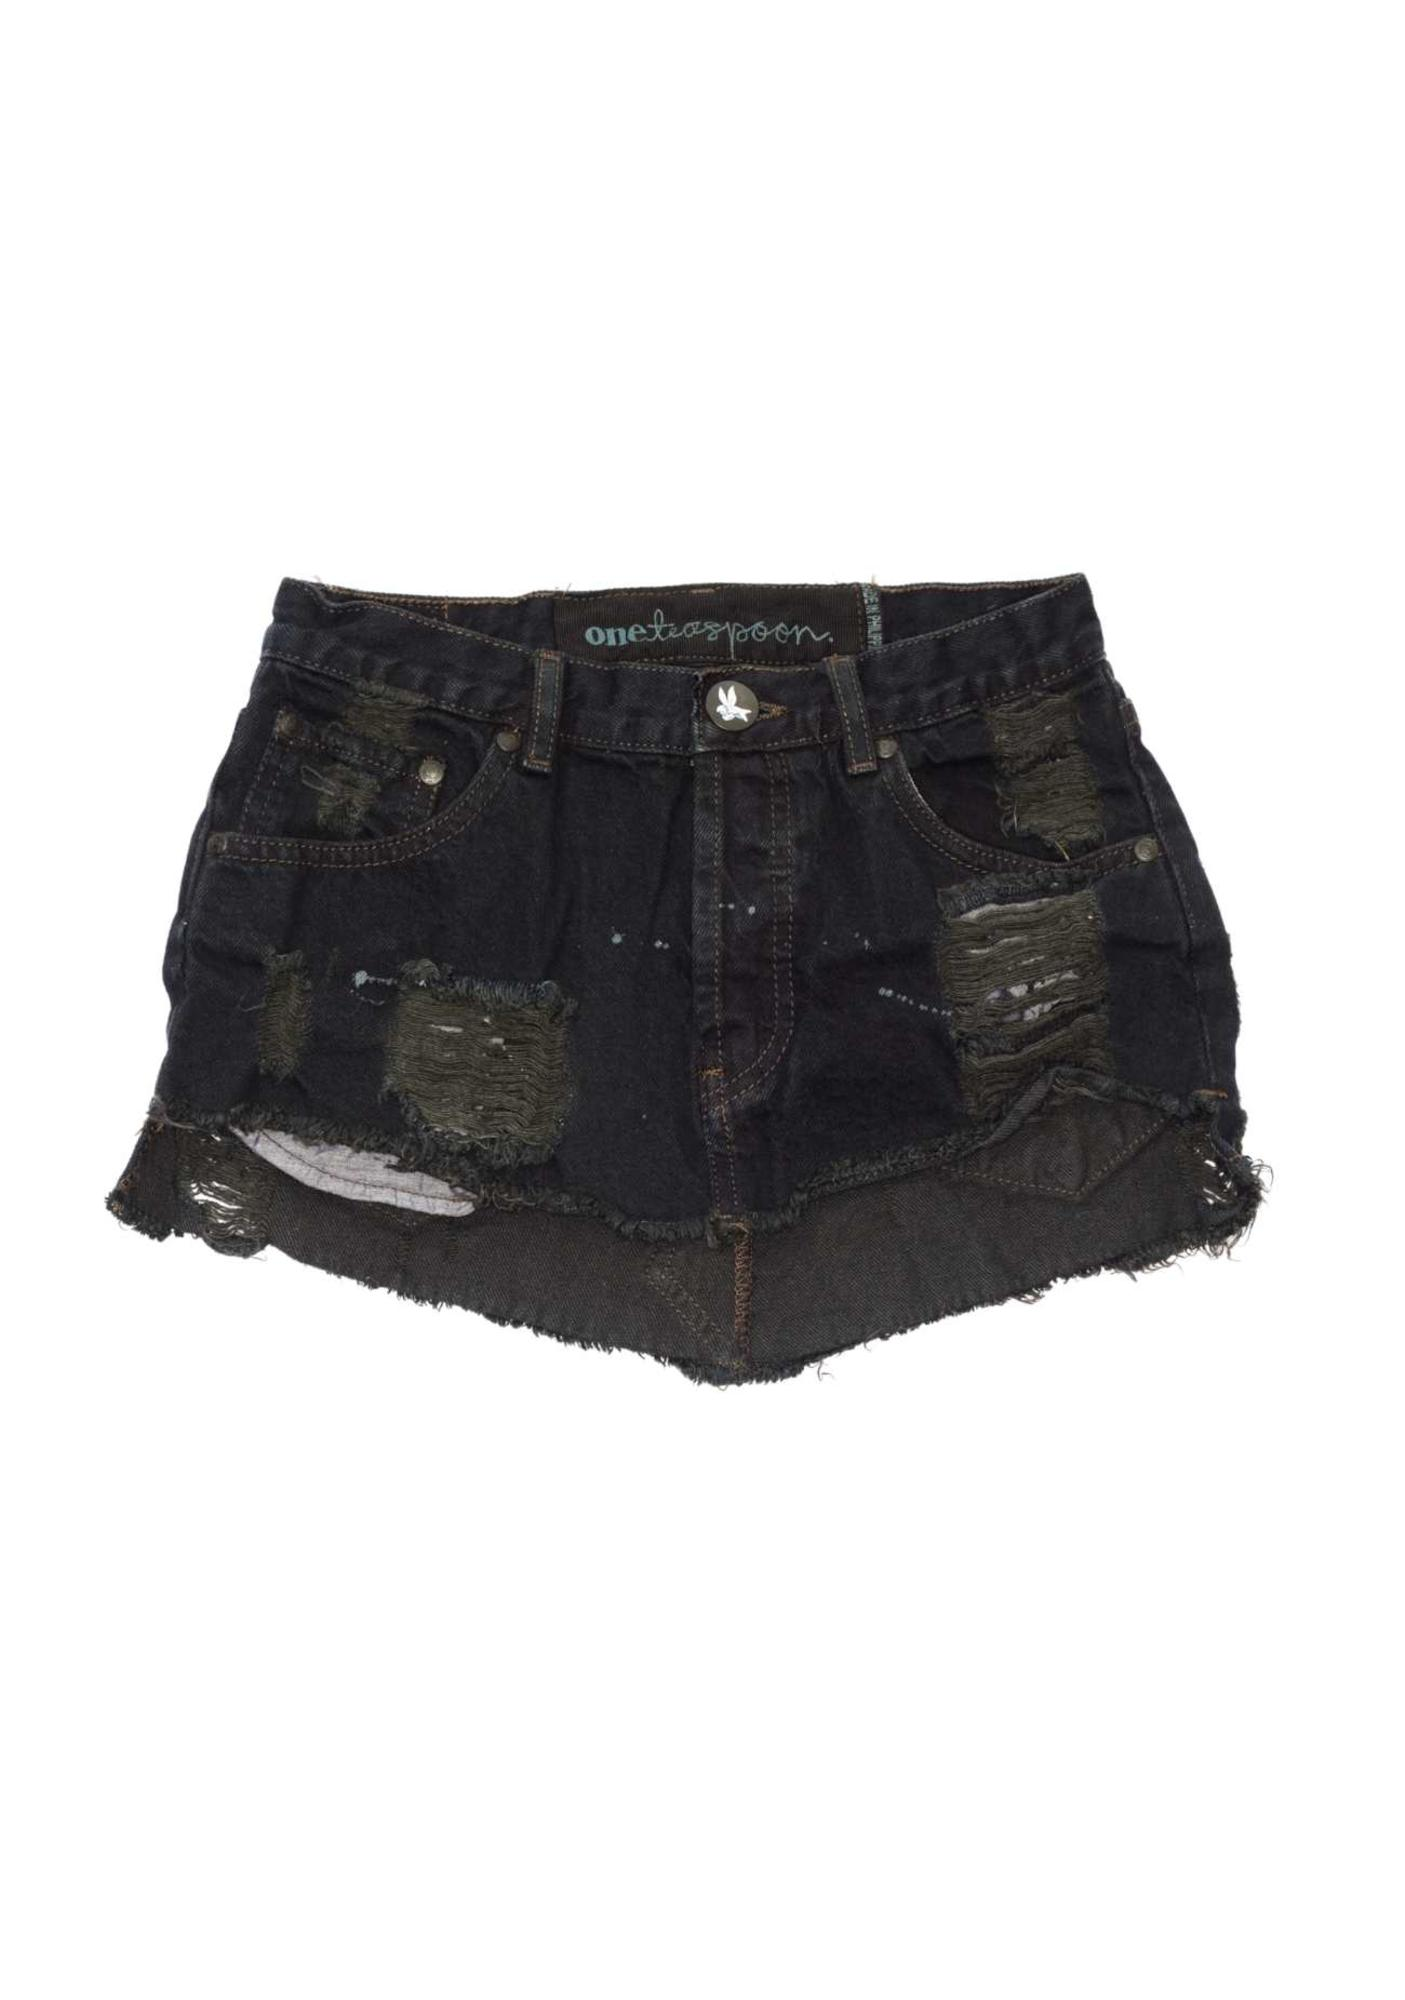 e Teaspoon Junkyard Mini Skirt